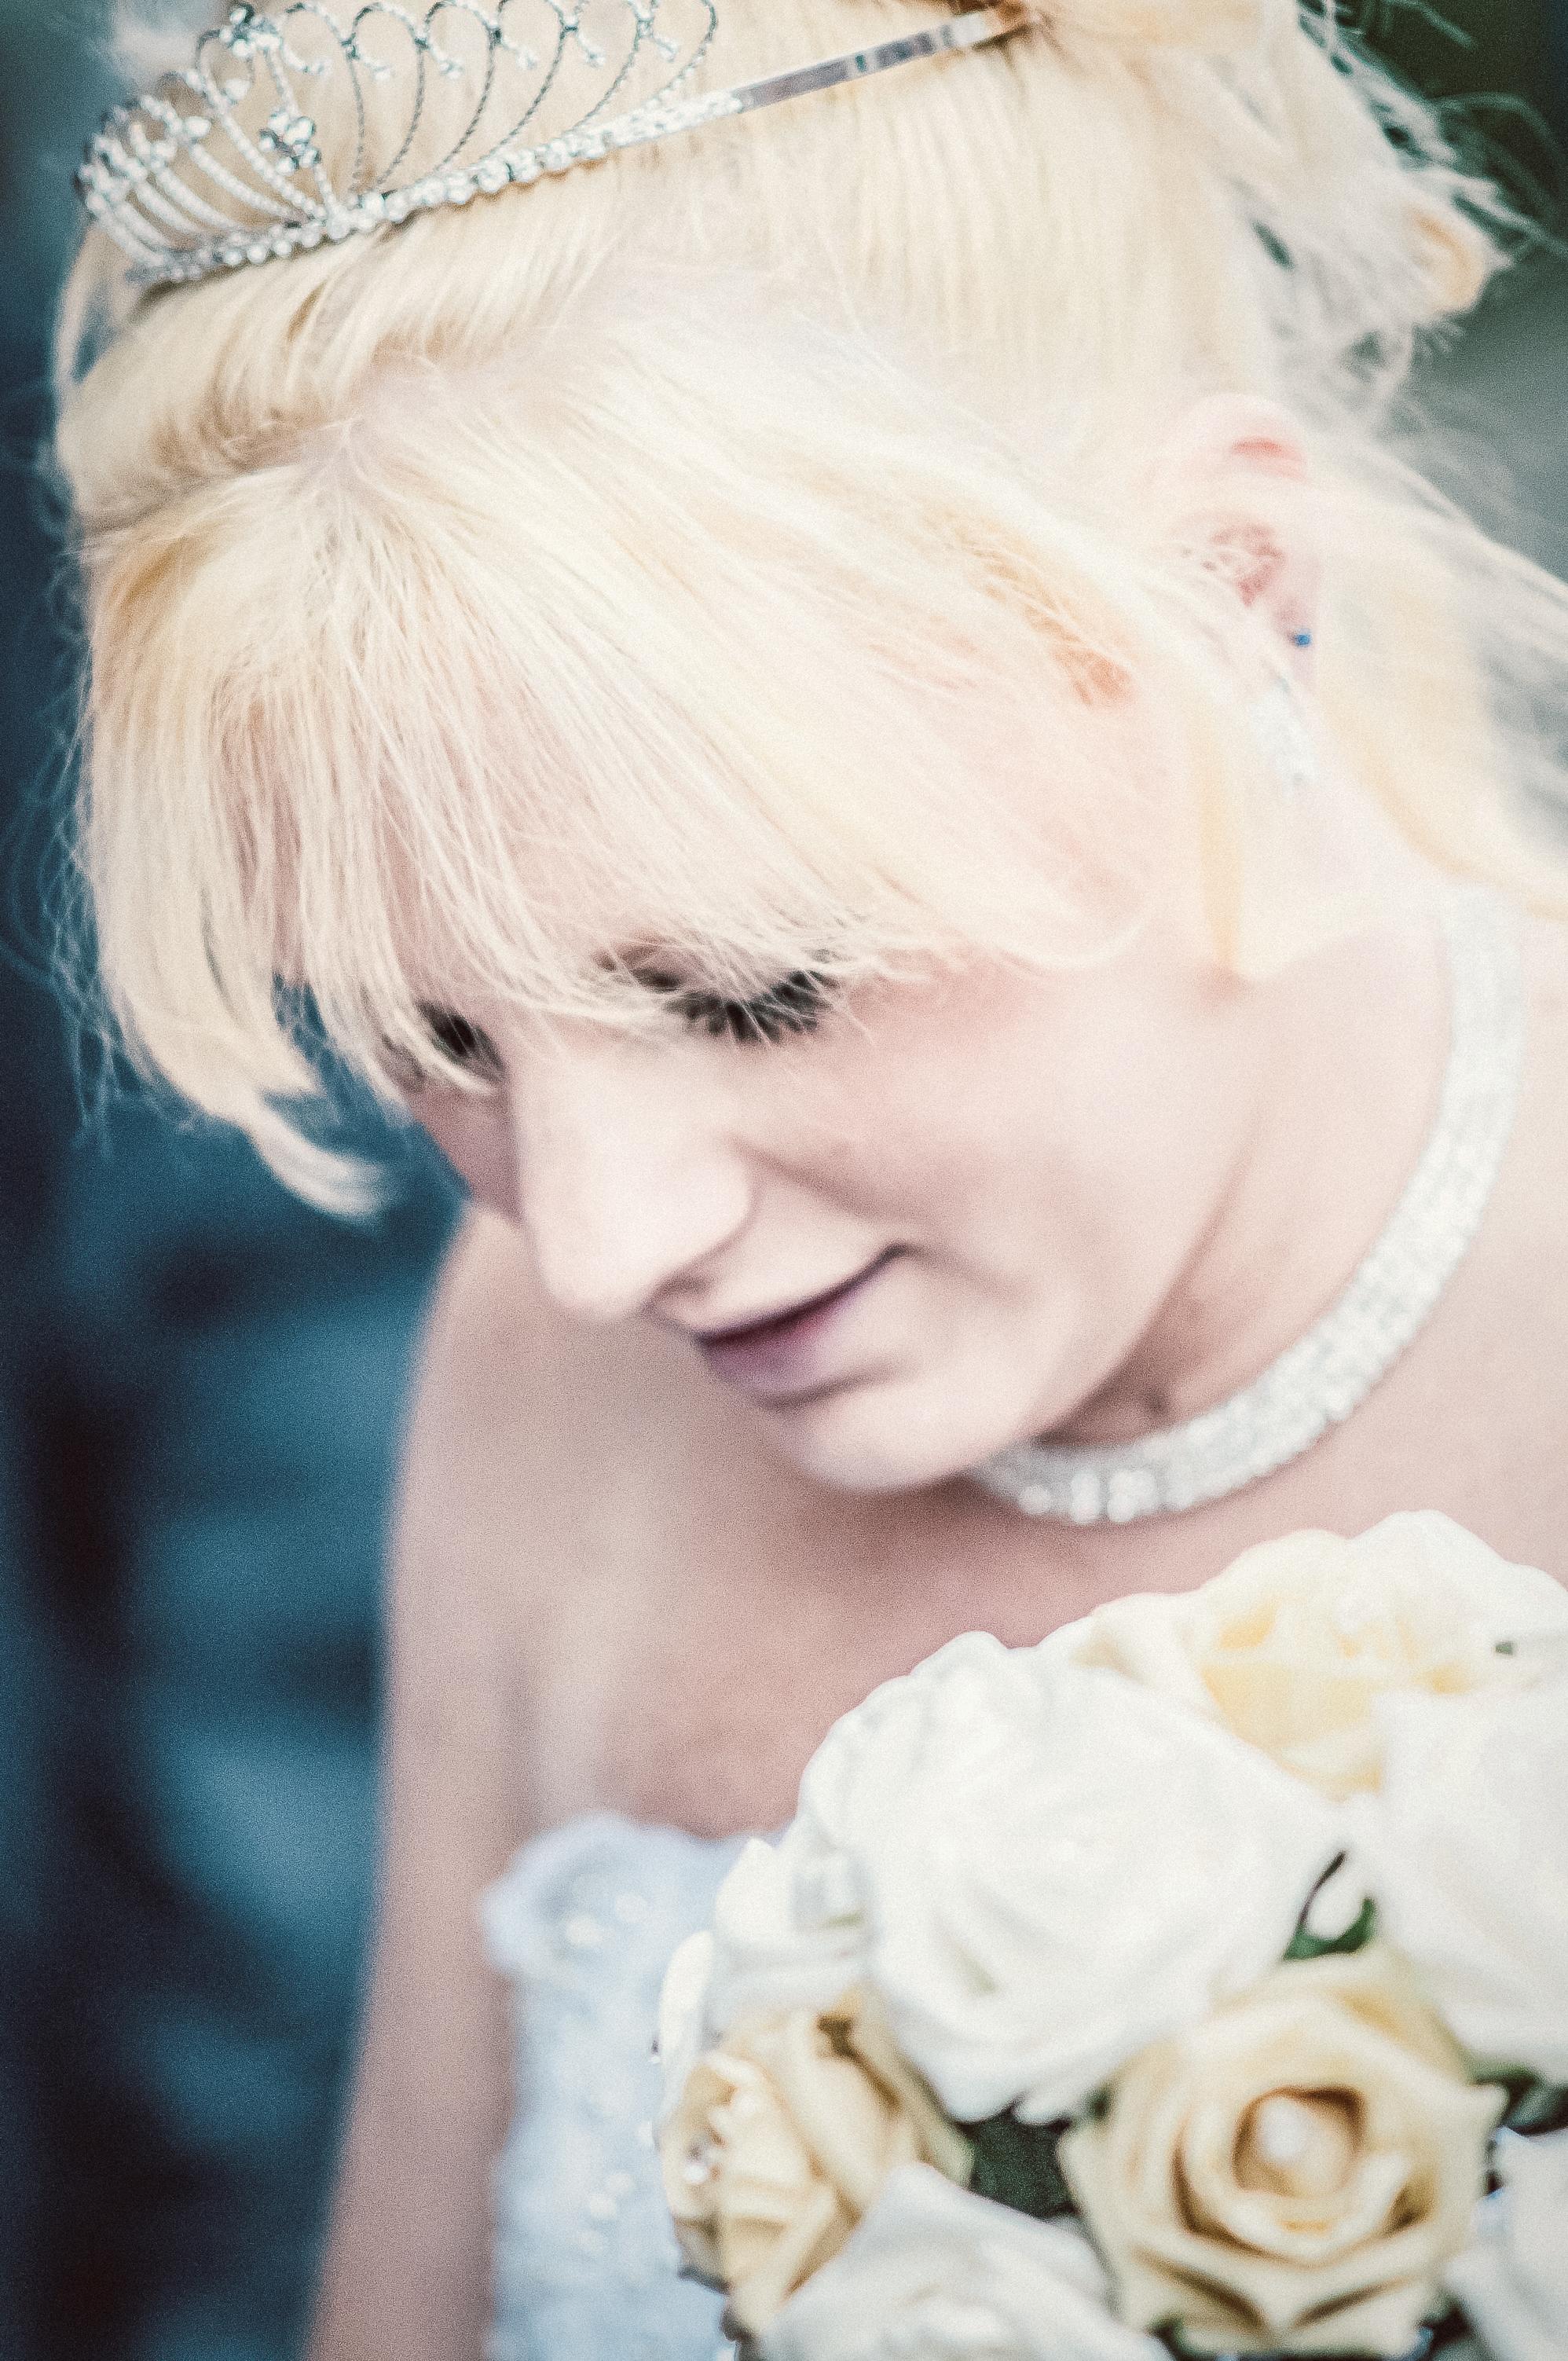 My second wedding.  Nikon D300 | 135mm | F2.8 - 1/2000th - iso1000